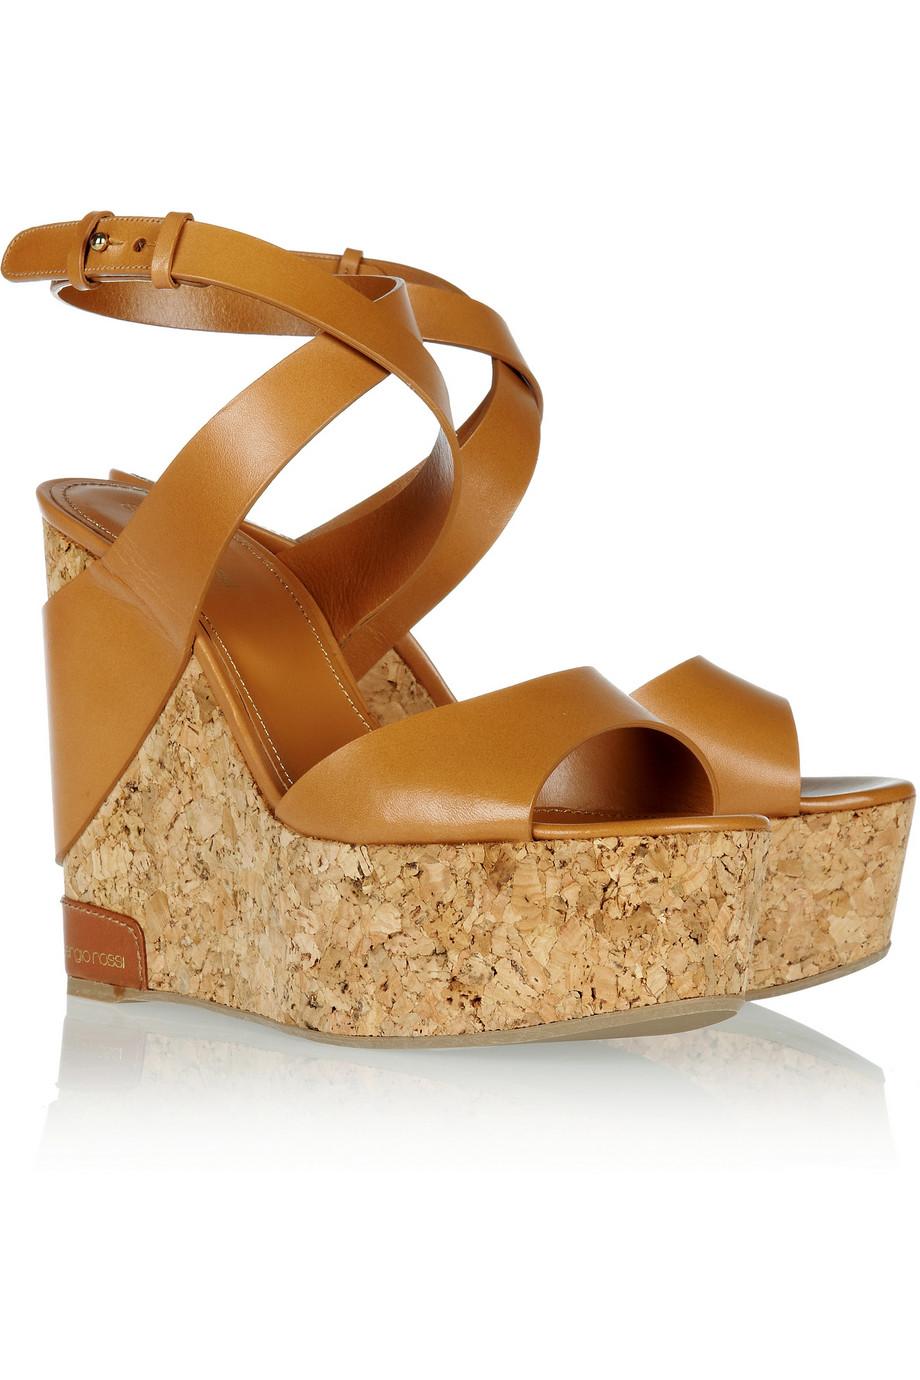 Sergio Rossi Wedge Sandals platform leather P3e8sNemxD